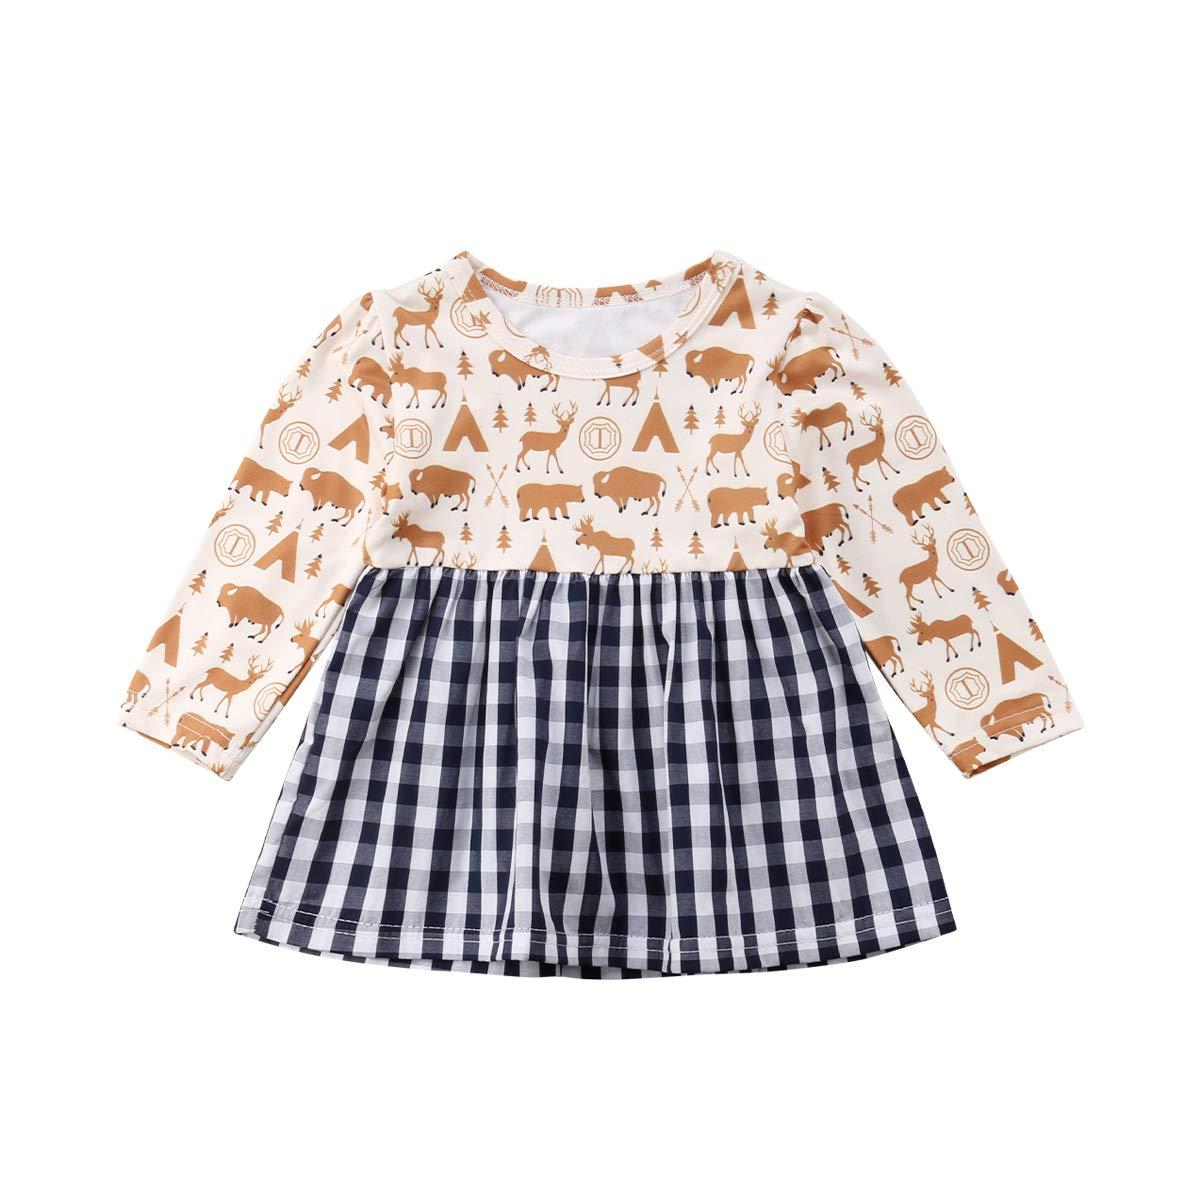 Princess Girls Clothes Long Sleeves Baby Kids Dress Animal Print Plaid Dress